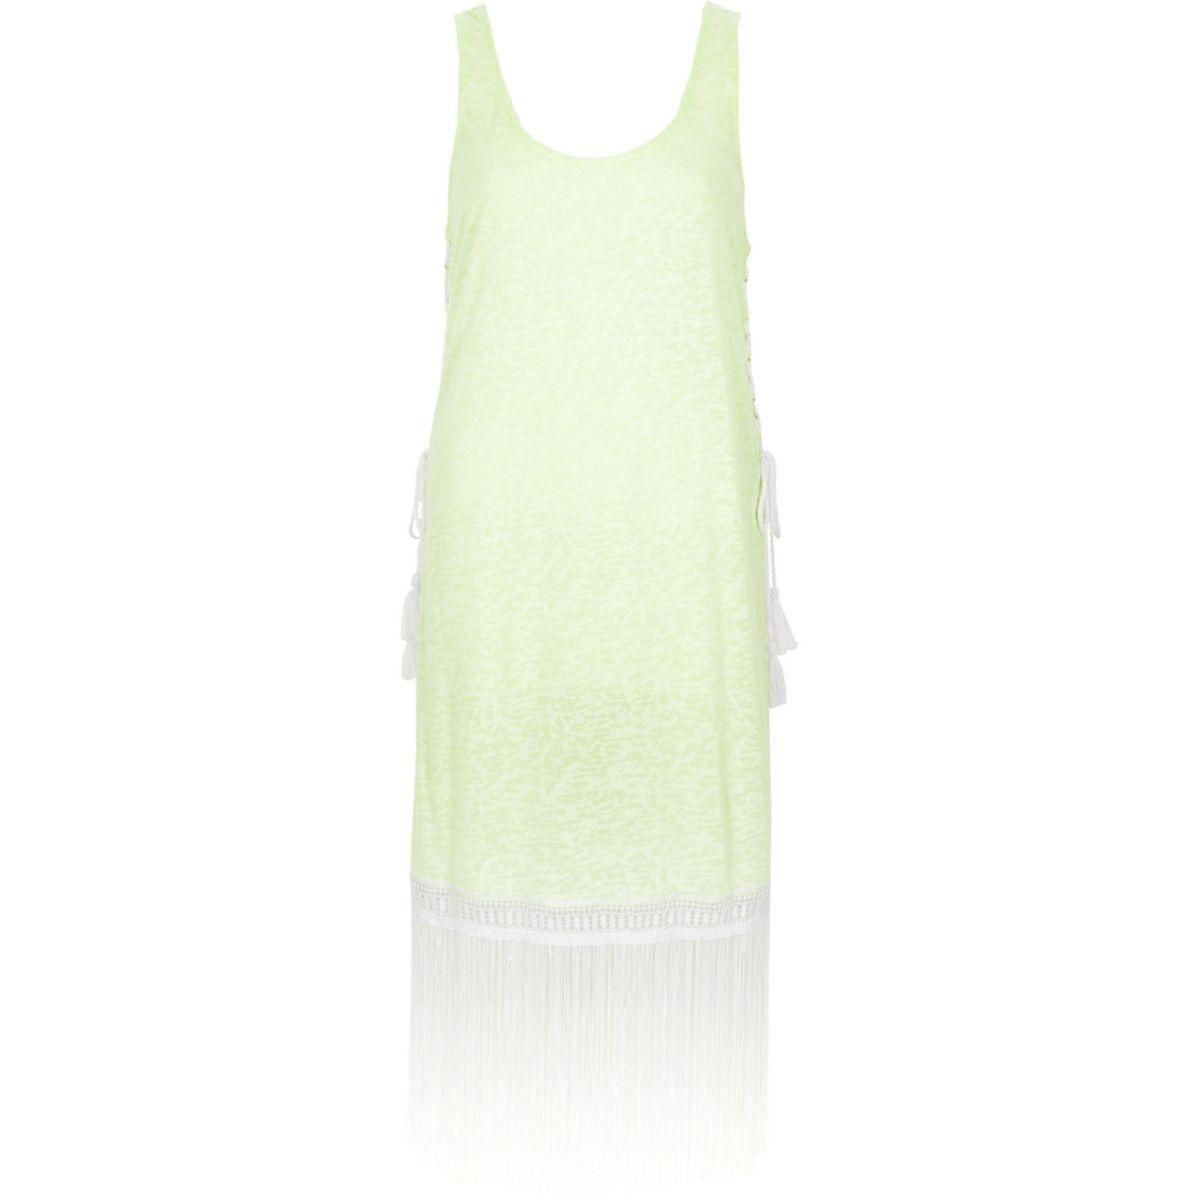 Neon yellow burnout fringe trim tank dress